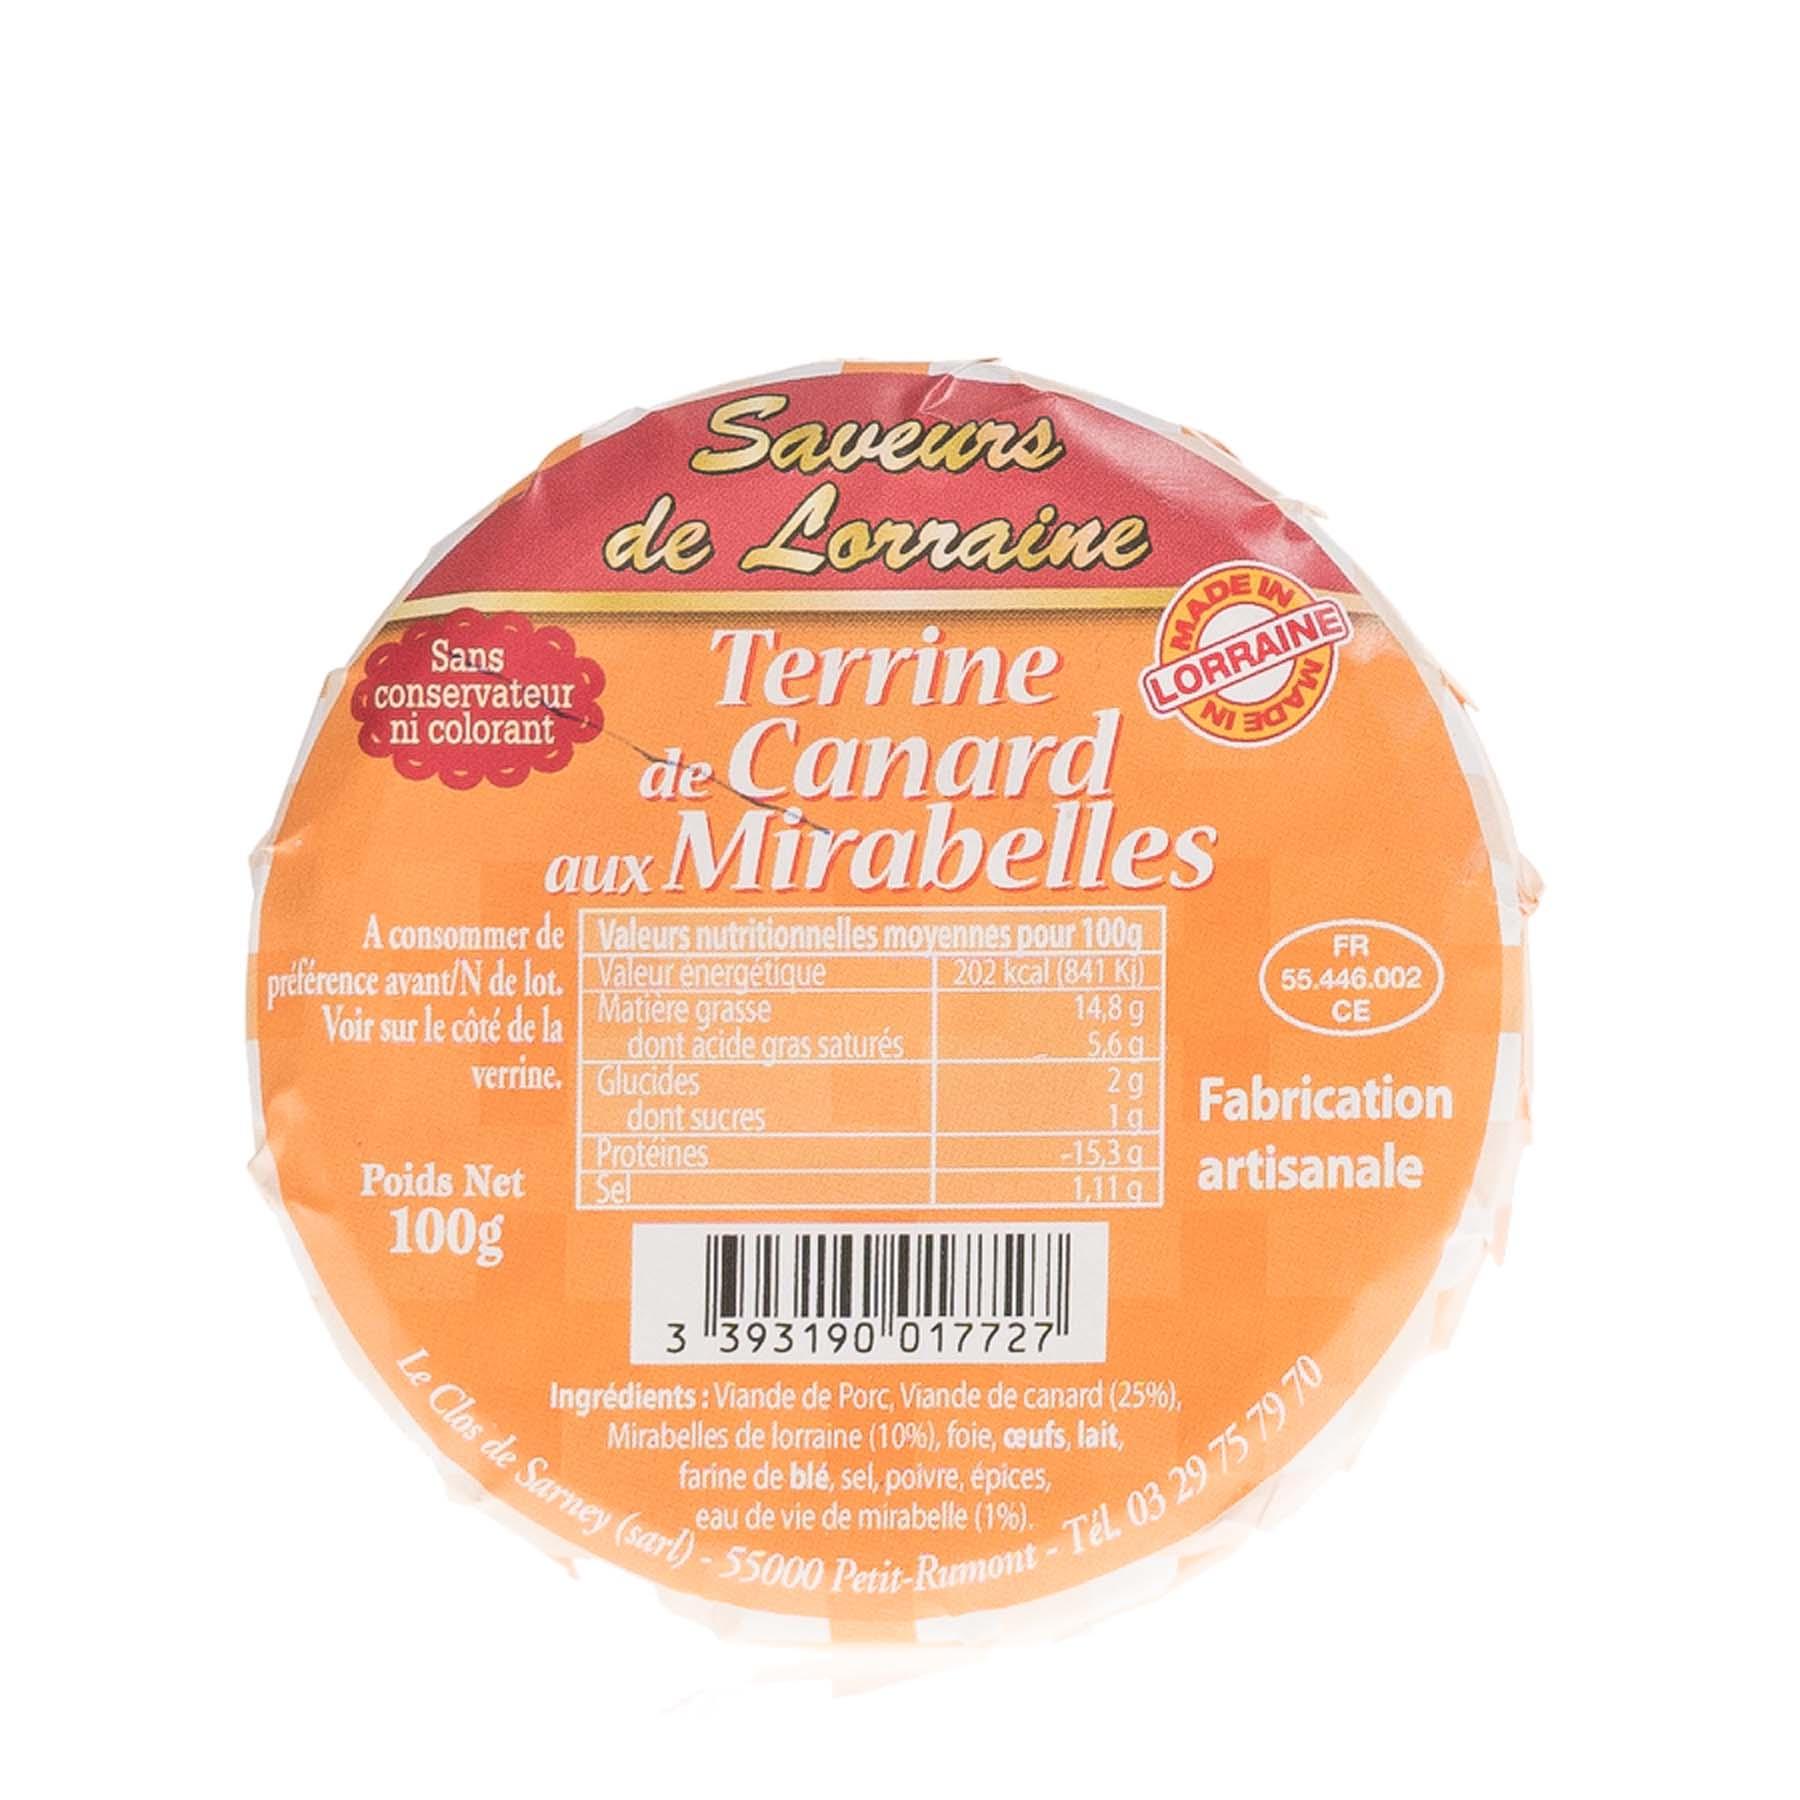 Terrine de Canard à la Mirabelle de Lorraine